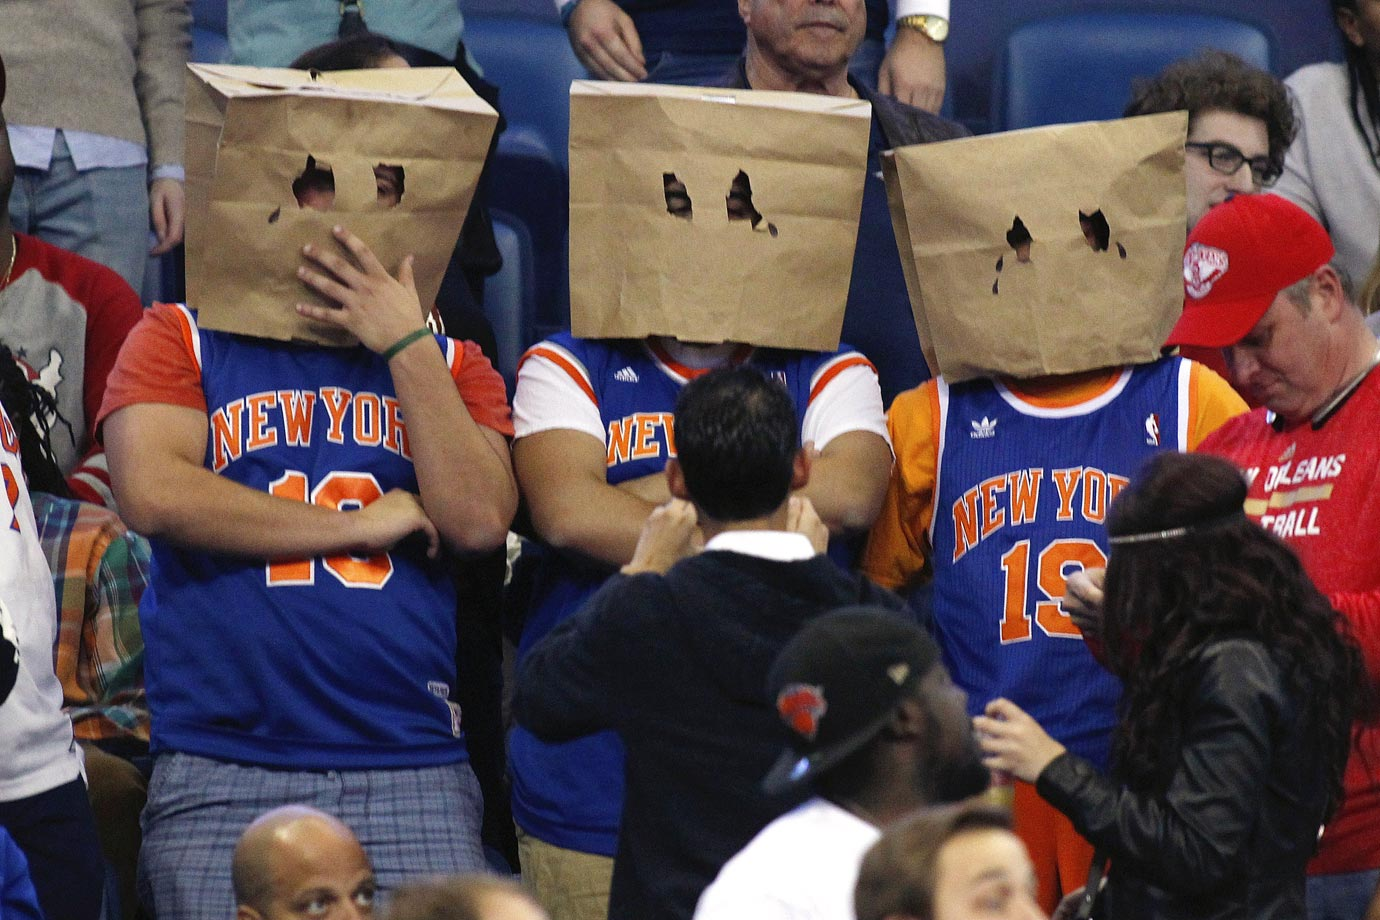 Knicks pride in full effect.